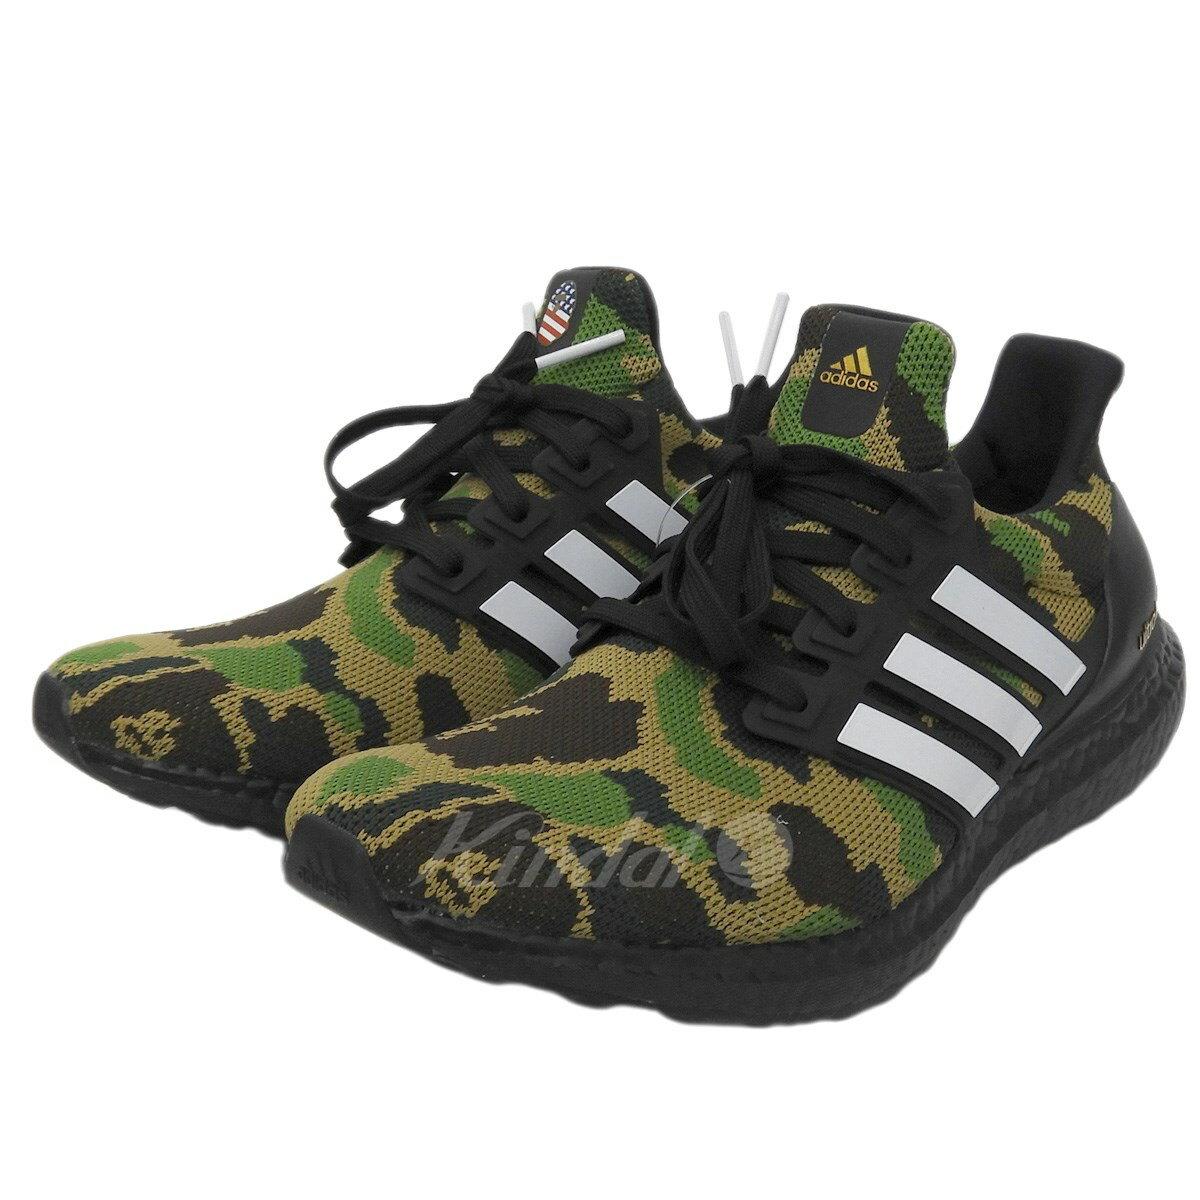 finest selection 90f34 000d4 A BATHING APE X adidas